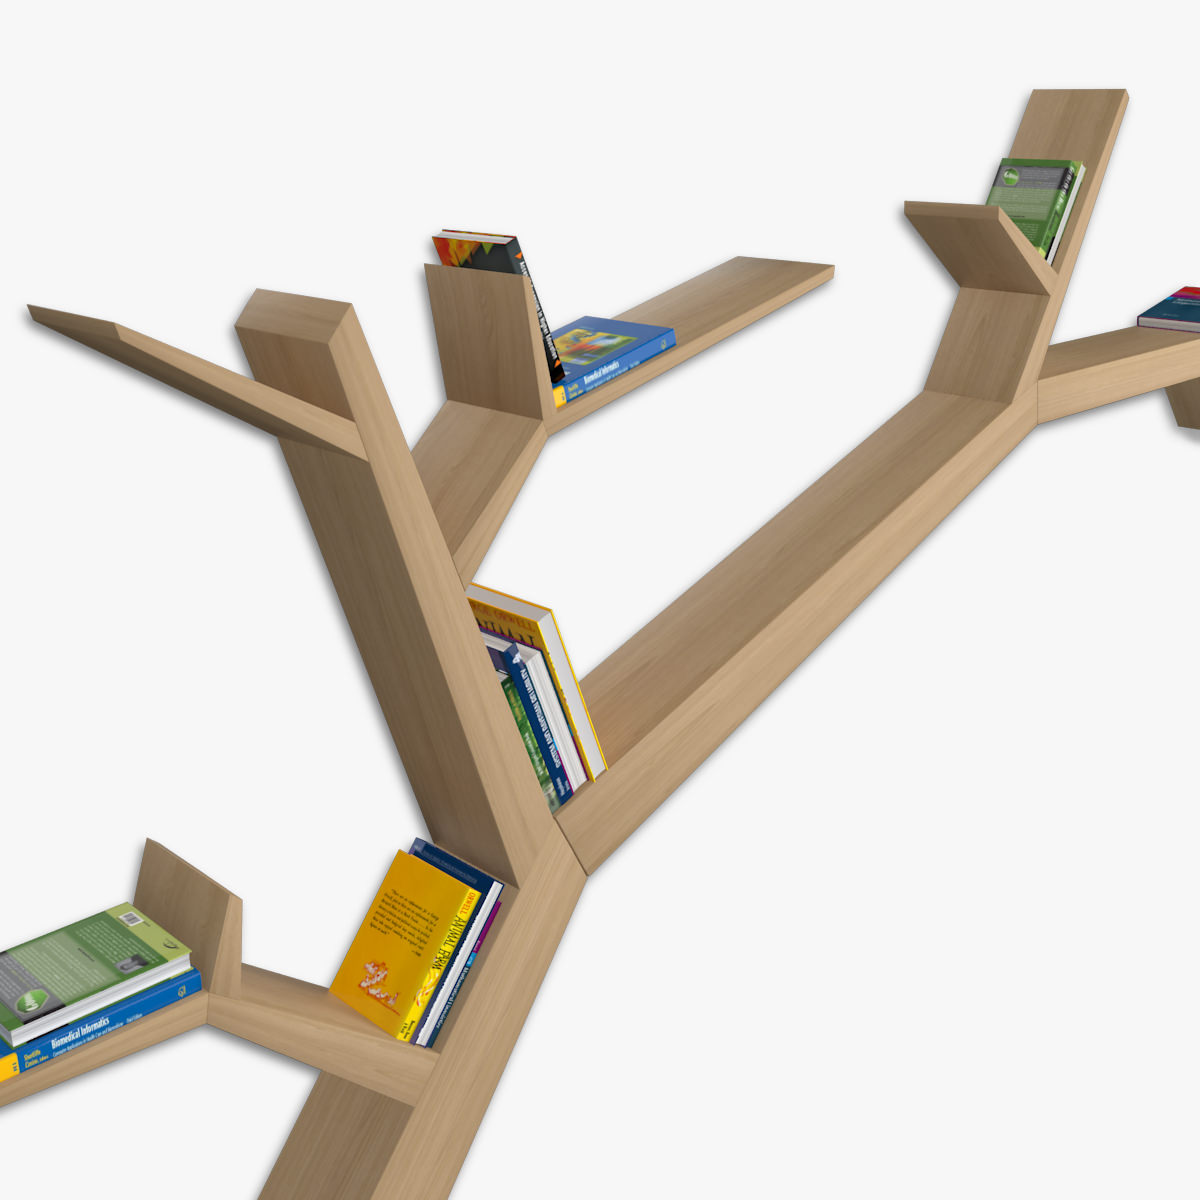 Bookshelf Branch 3d Model Max Obj Mtl Fbx C4d Ma Mb 3